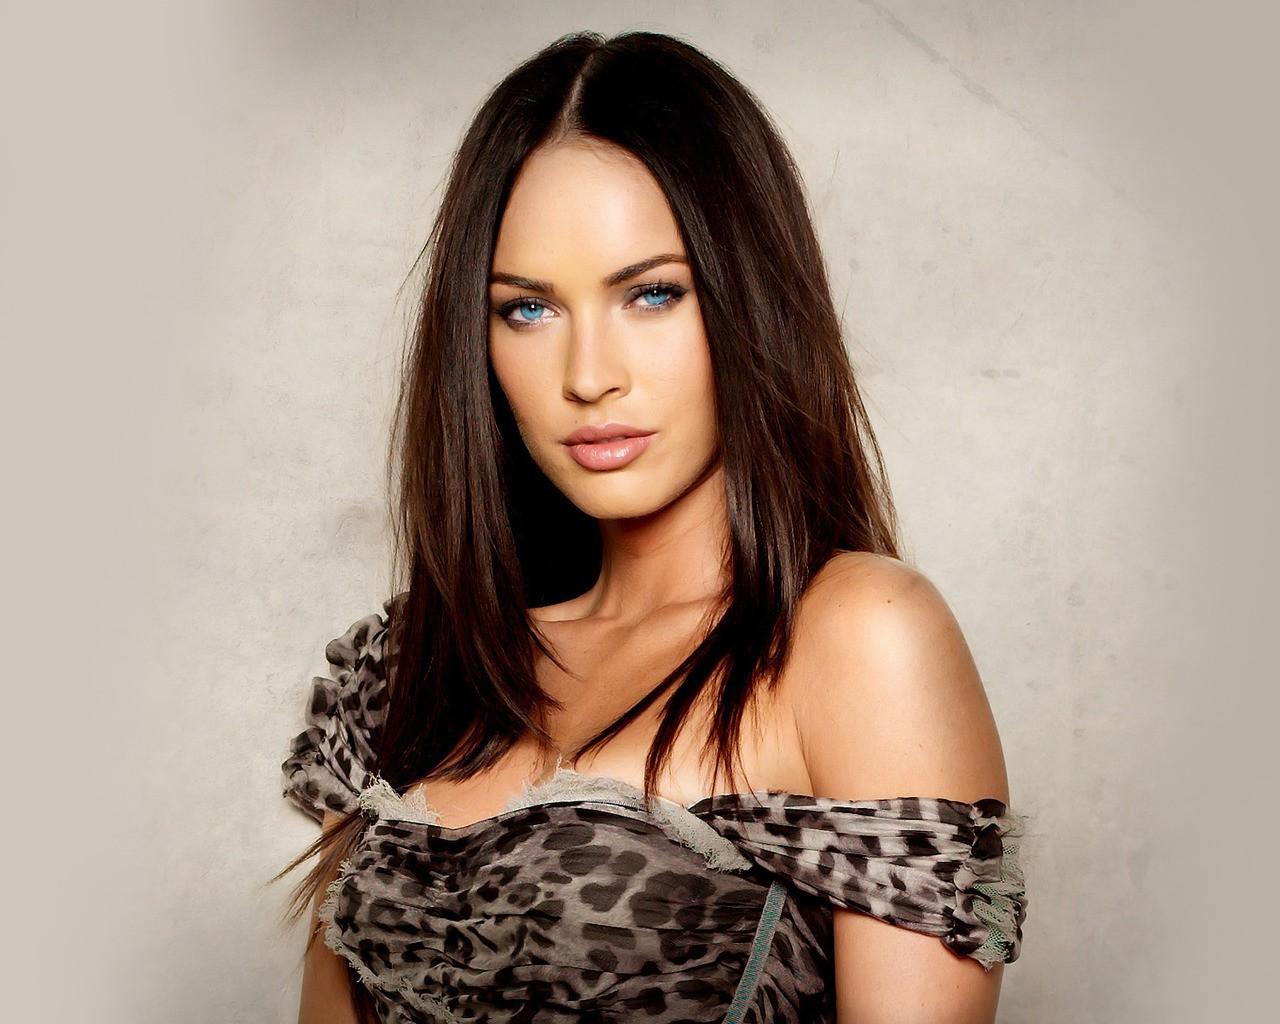 Megan Fox Wallpaper 1280x1024 1280x1024